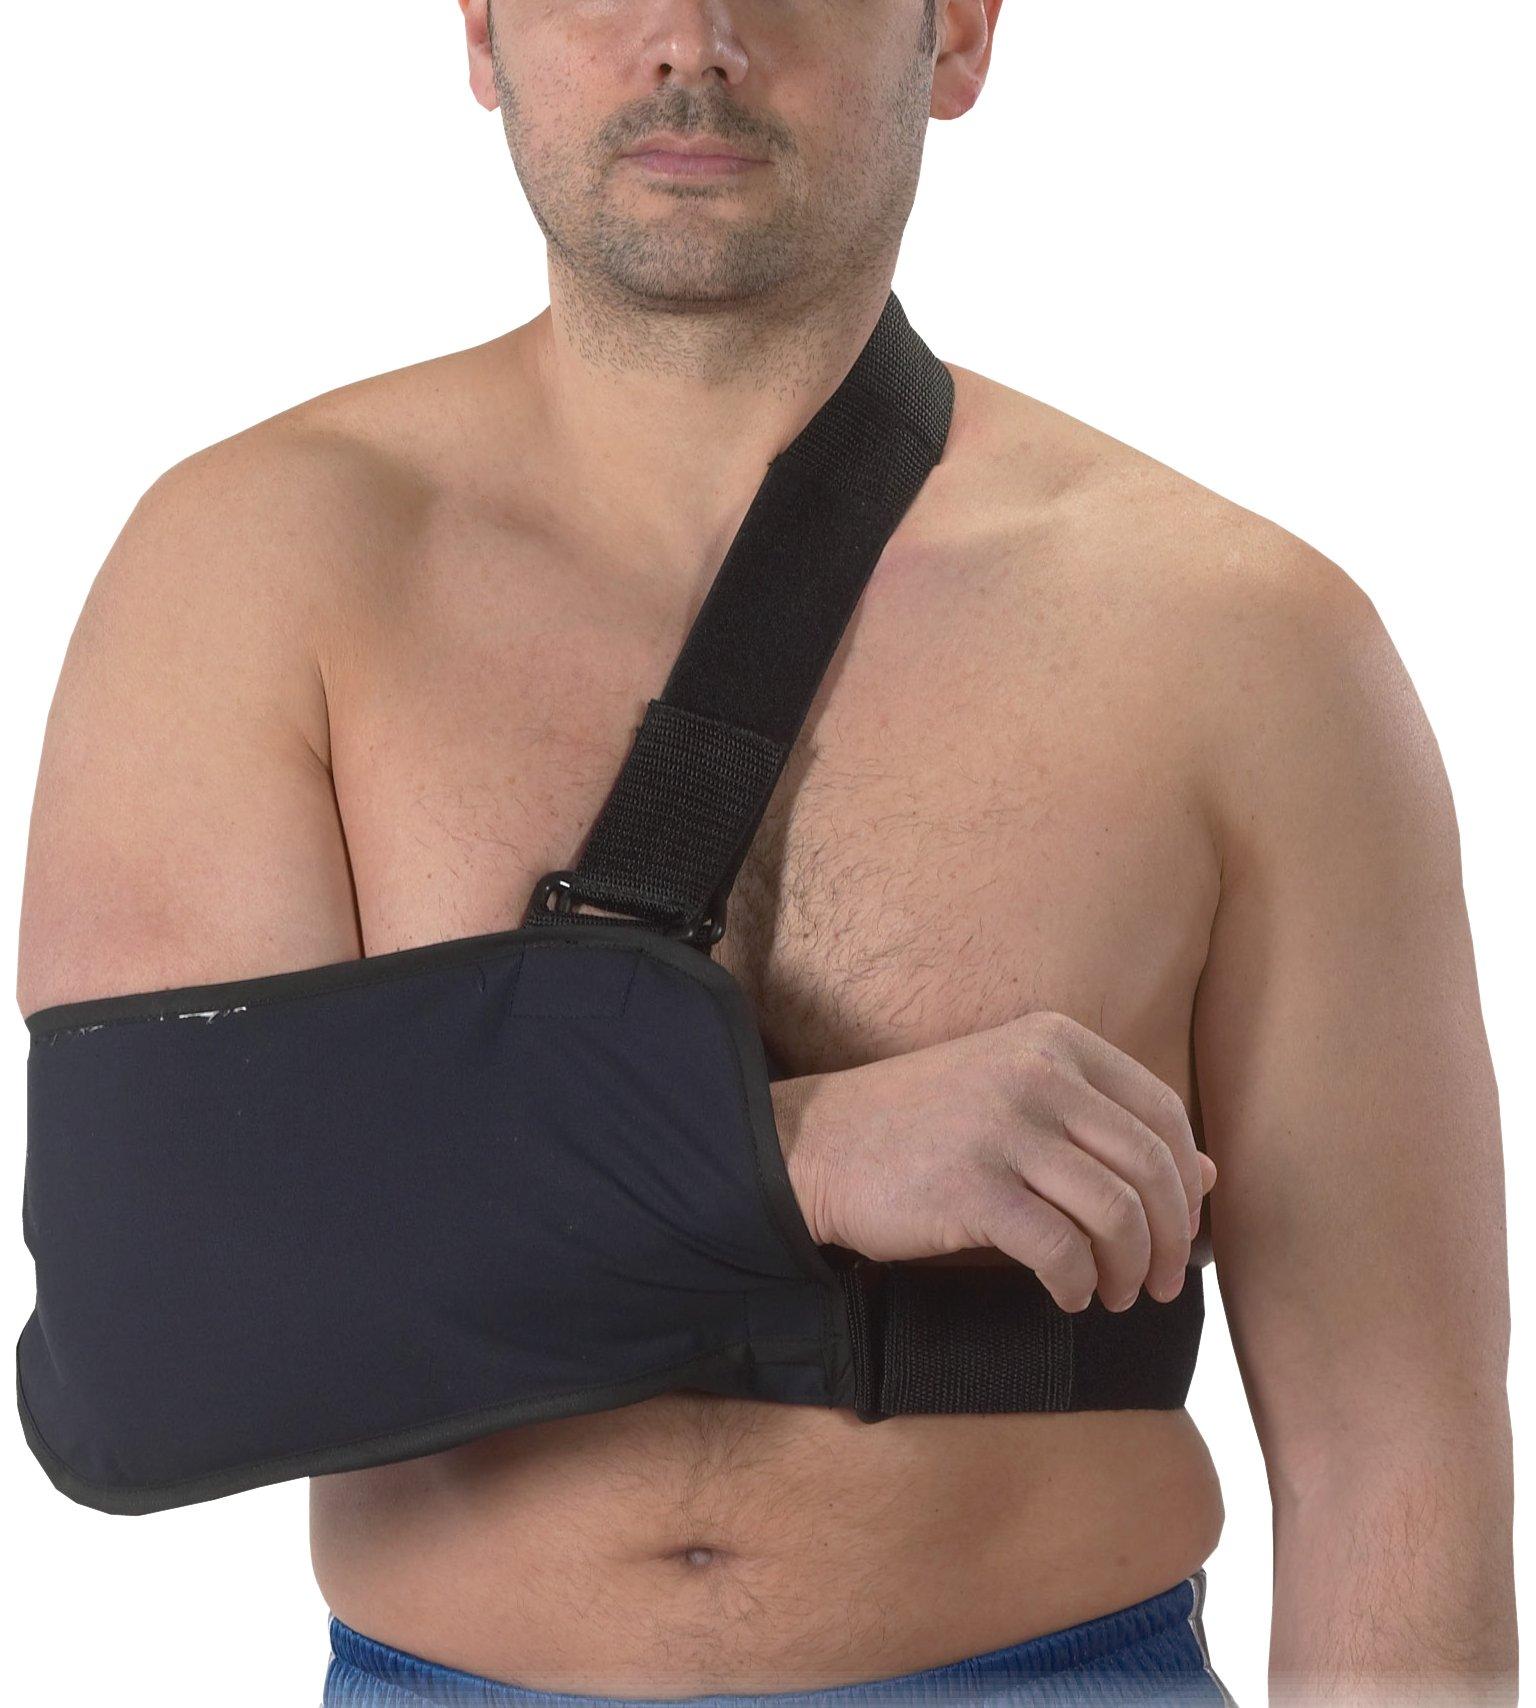 Bilt-Rite Mastex Health Arm Sling with Immobilizing Strap, Navy Blue, X-Large